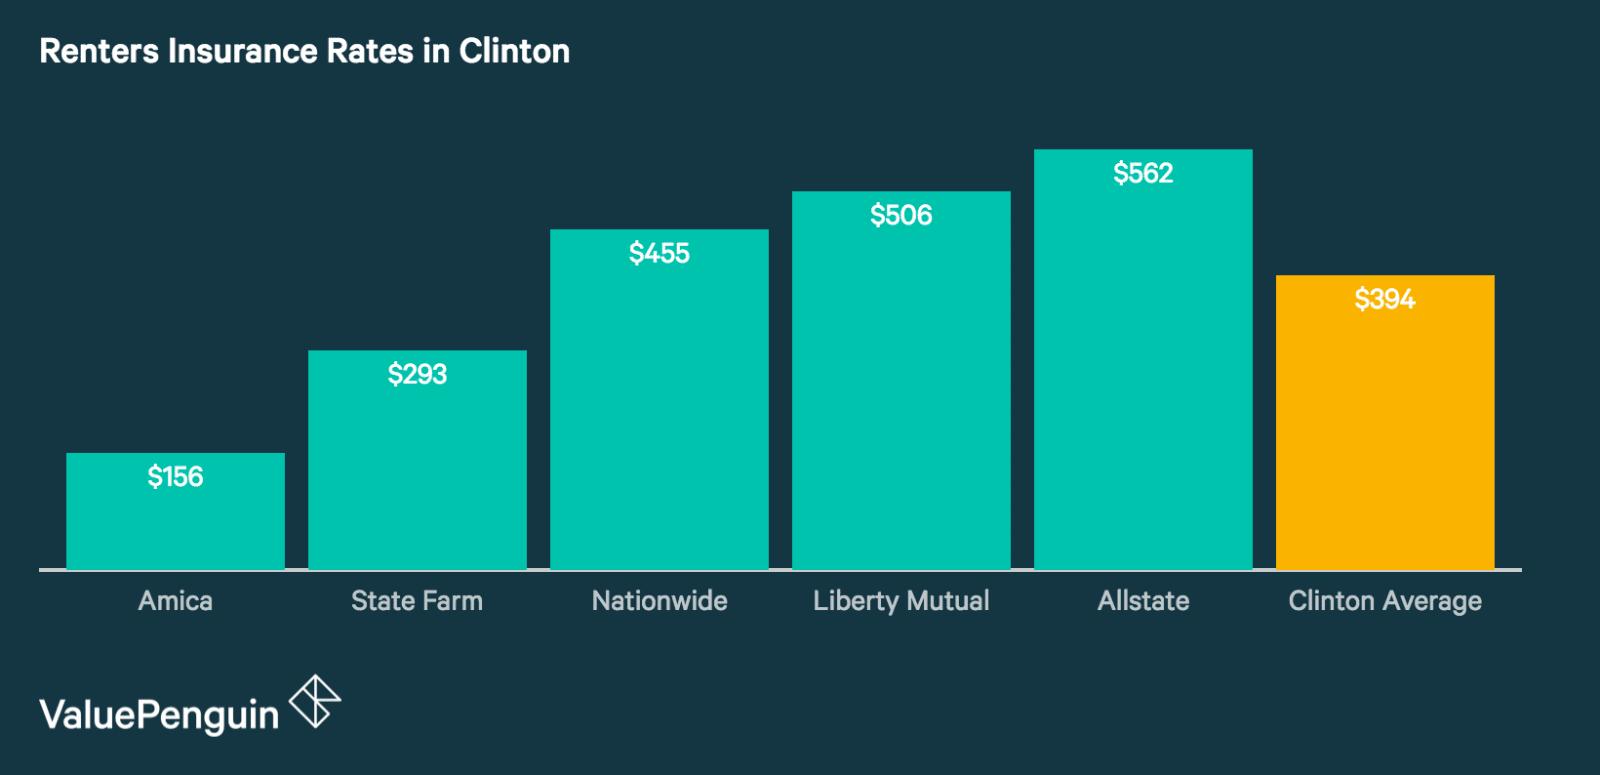 Best Renters Insurance Companies in Clinton